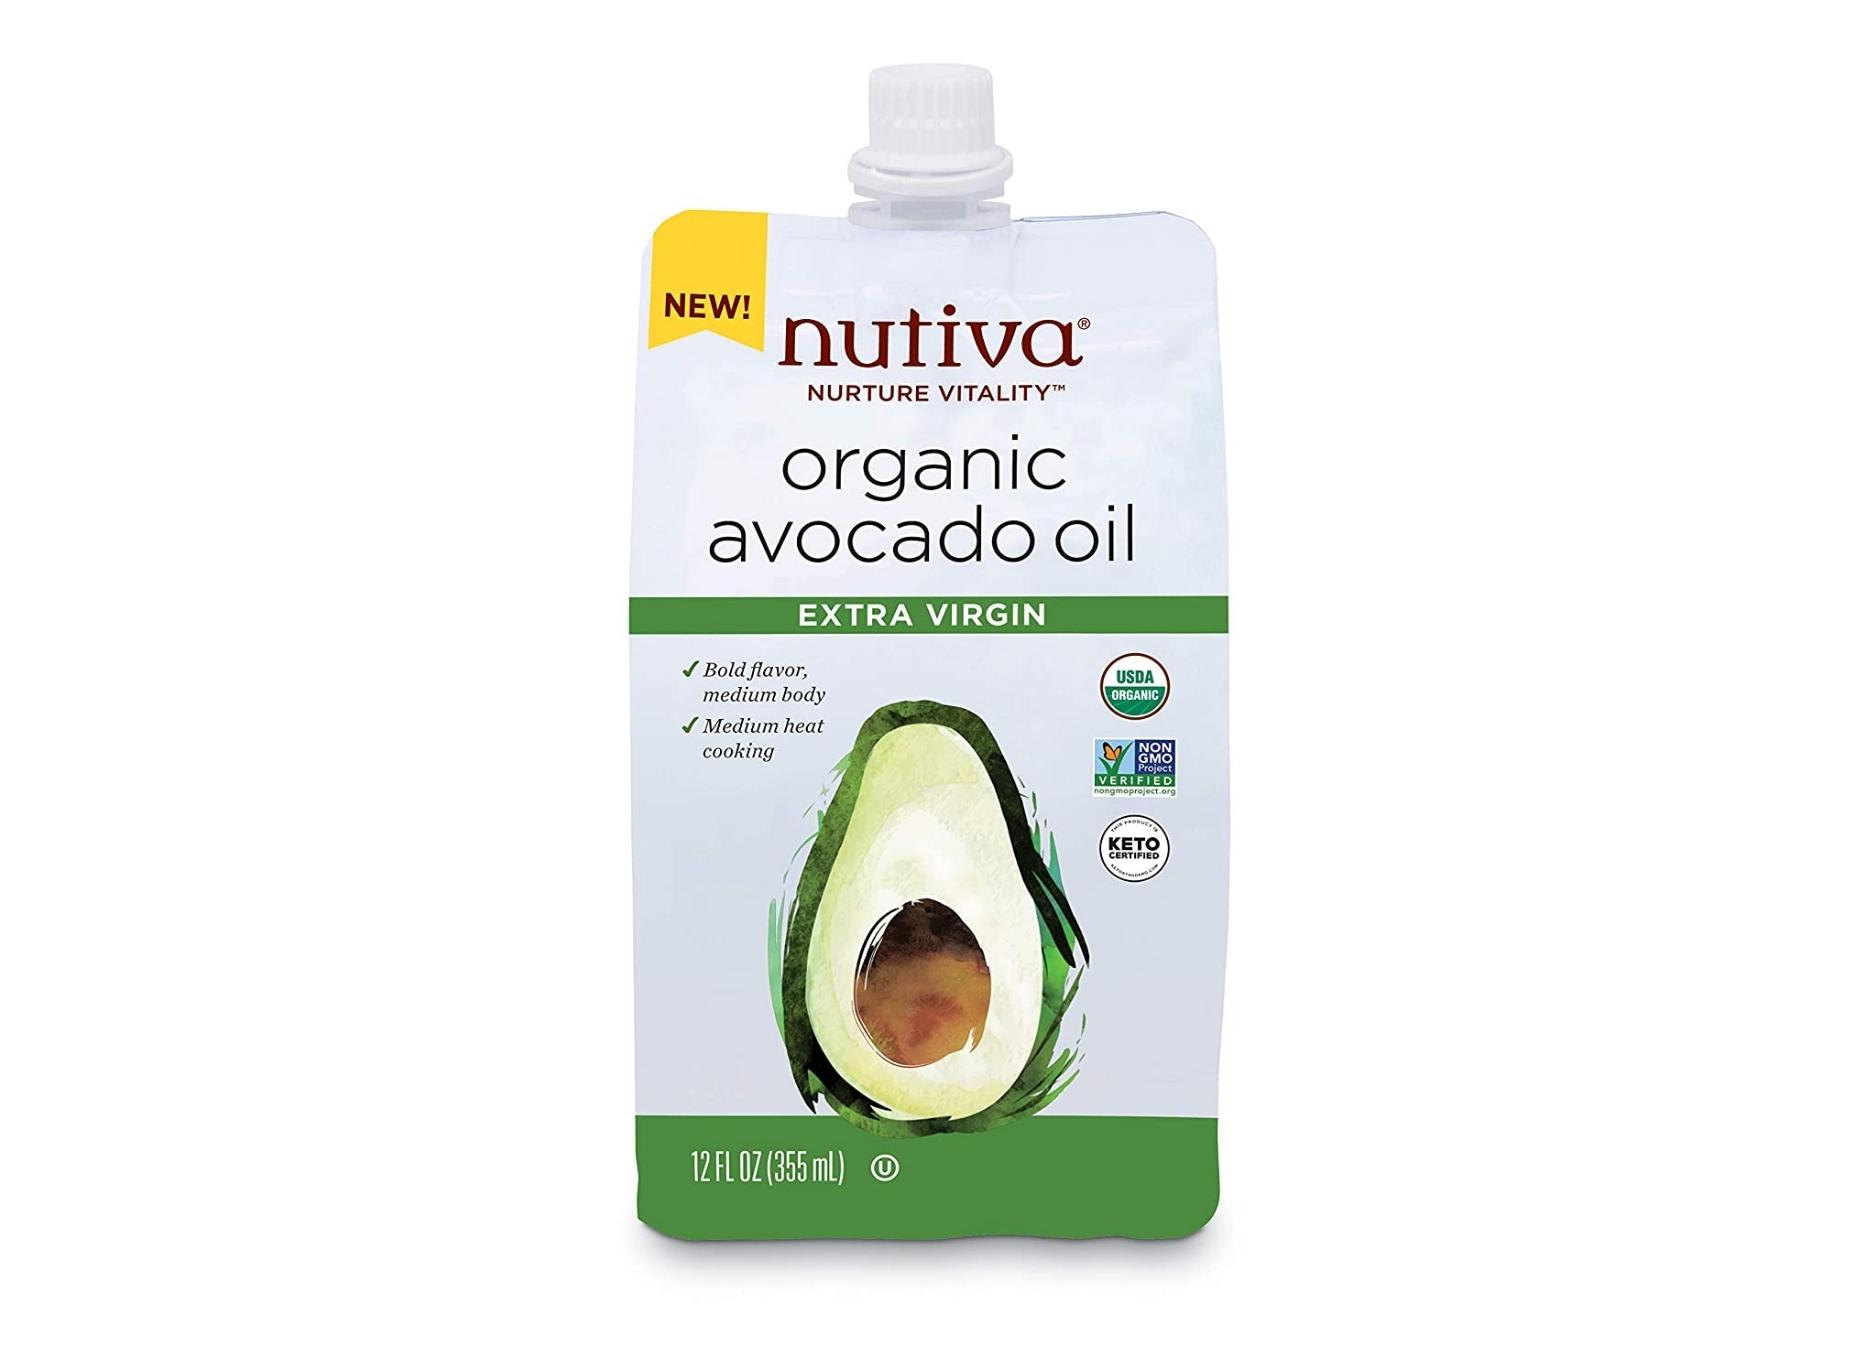 Nutiva Avocado Oil